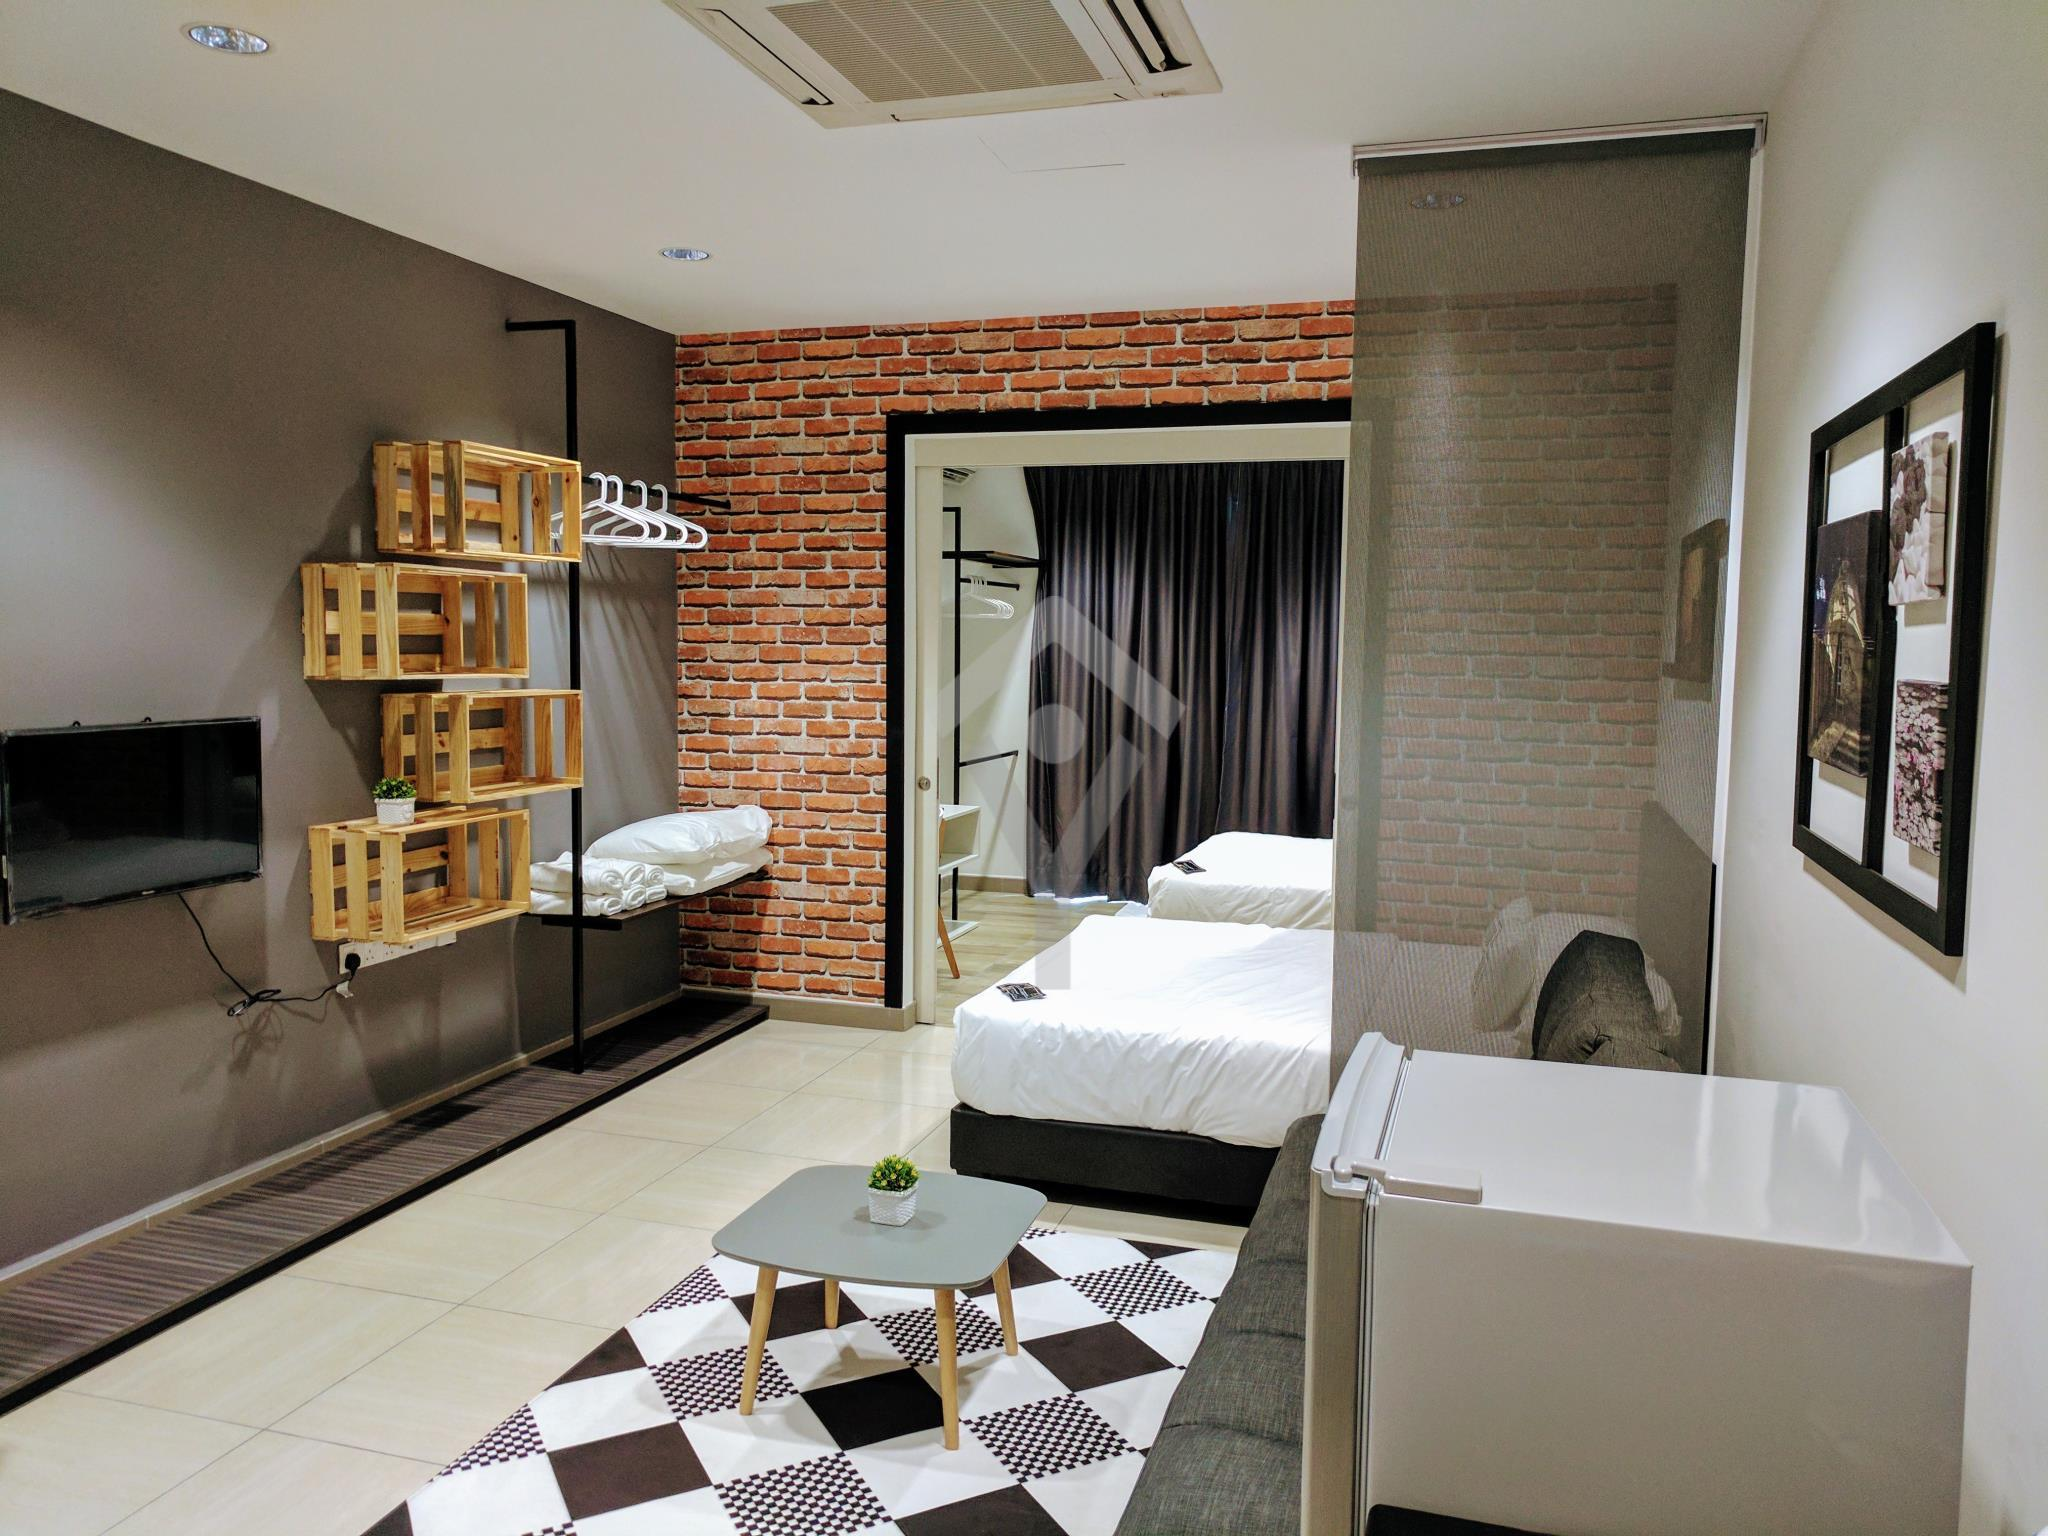 HomestayIpoh Octagon Studio Room With 2 Queen Bed